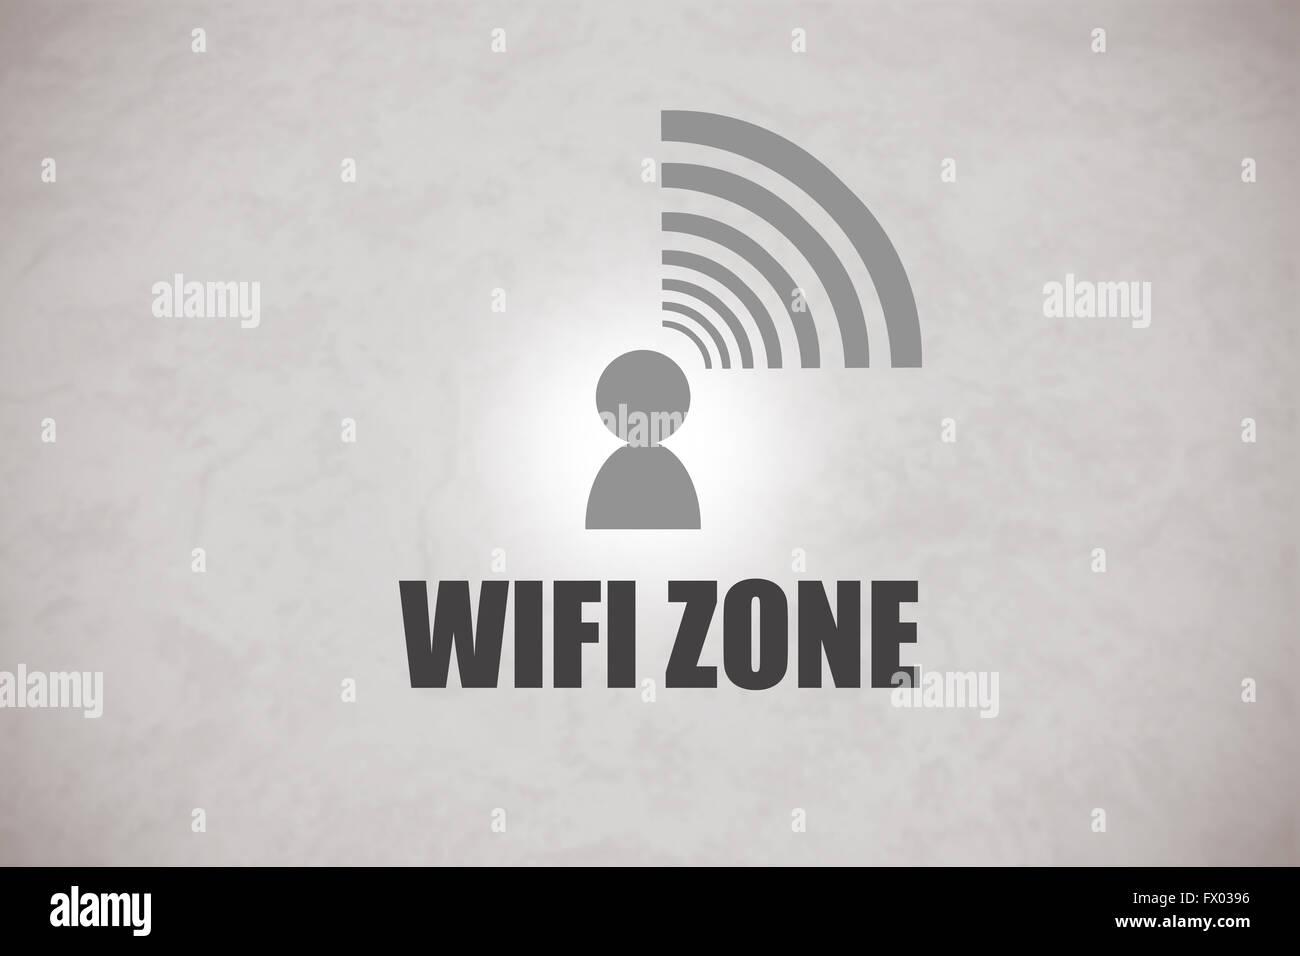 WIFI Zone logo in a grey background - Stock Image